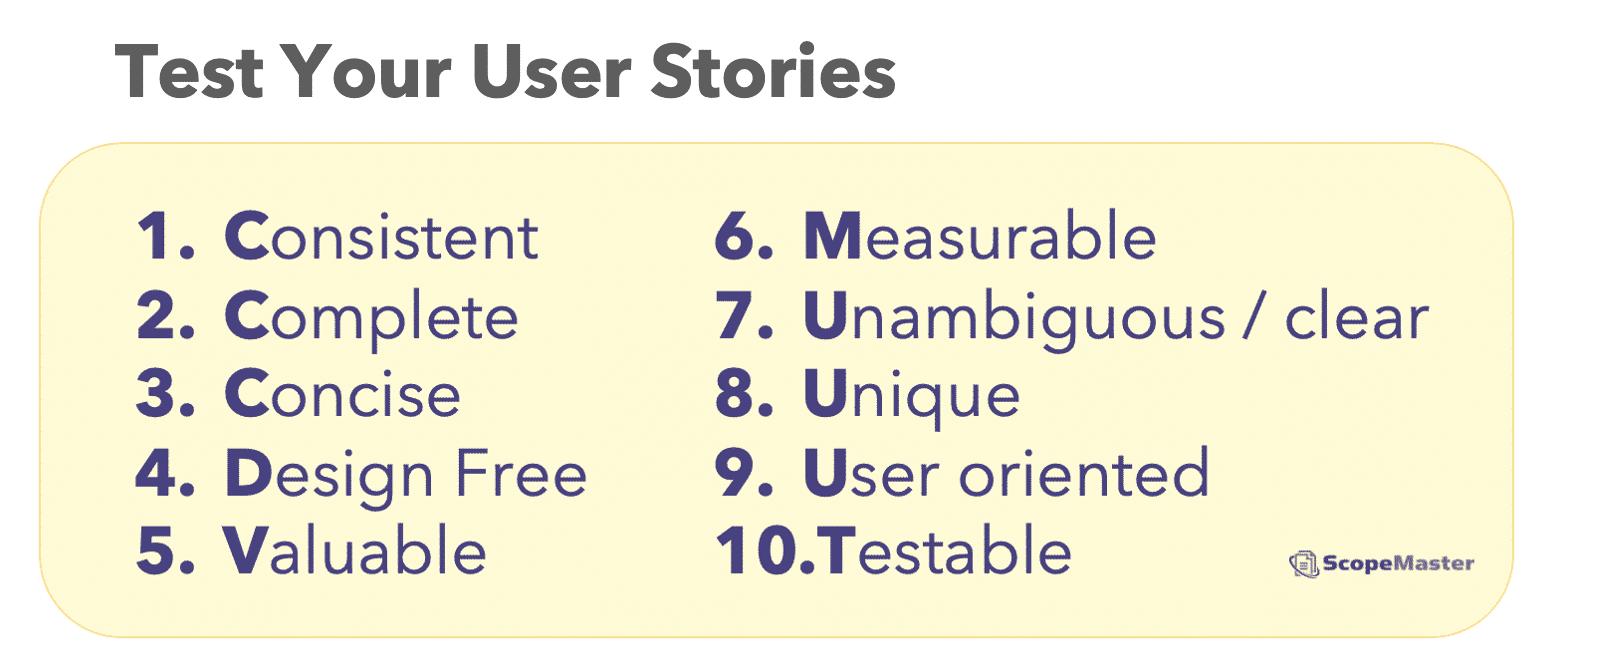 User Story Testing - 10 Quality Attributes